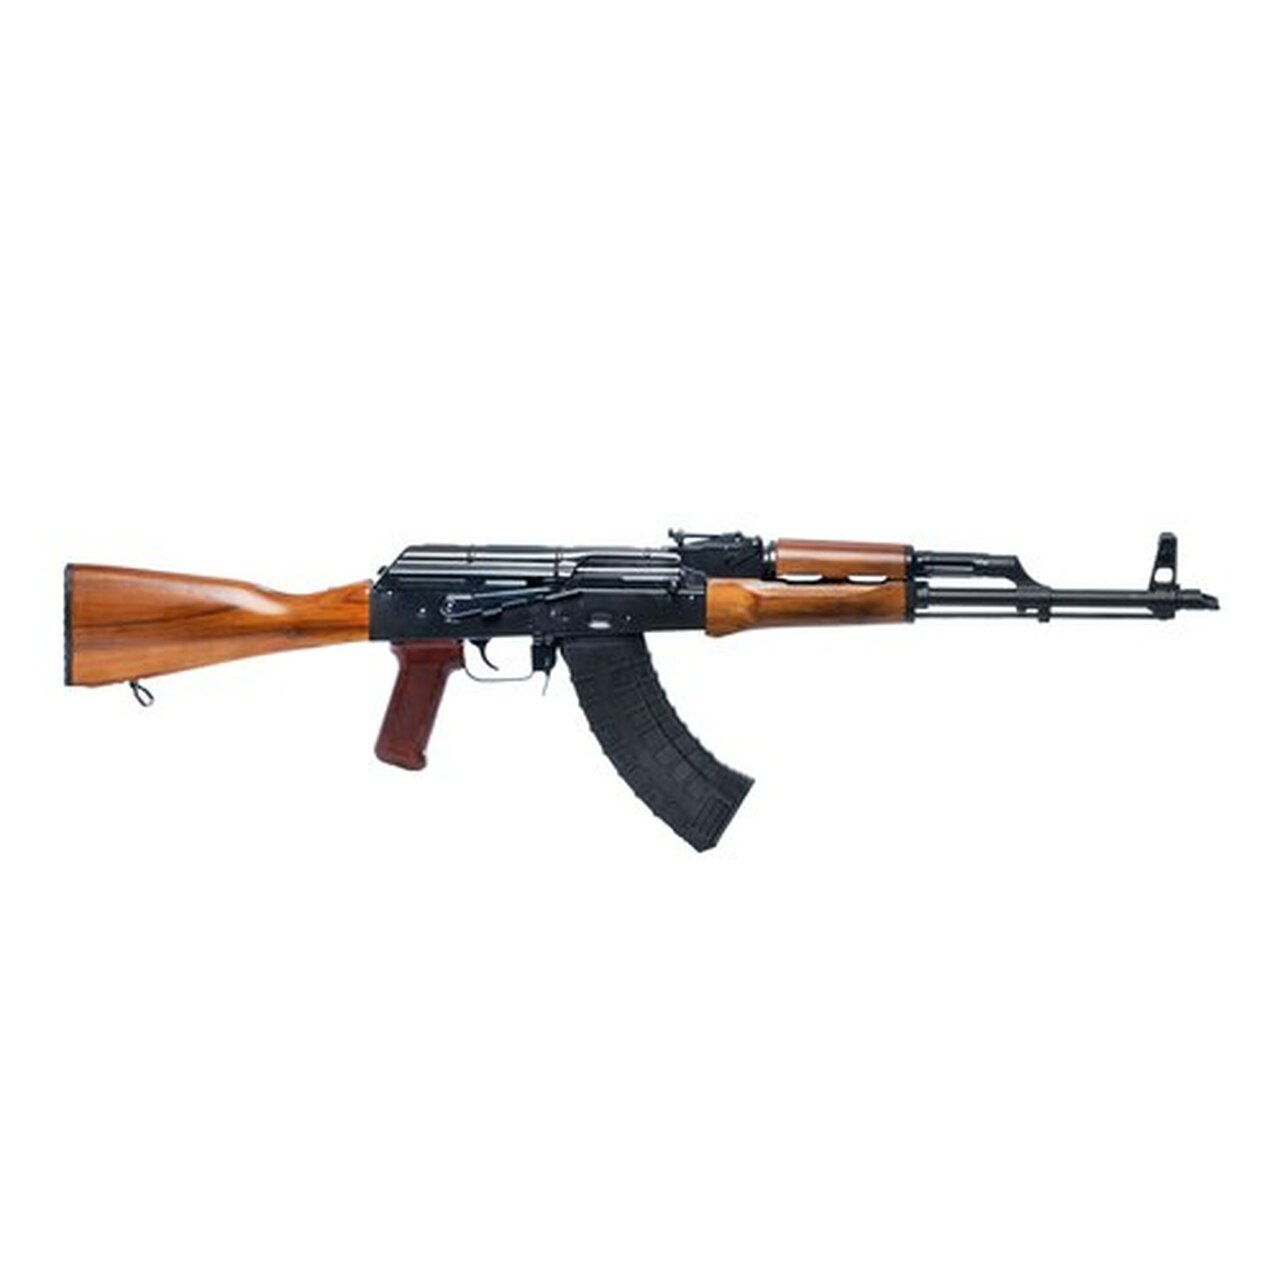 "Image of Riley Defense RAK47 AK, 7.62X39, 16"" Barrel, Black, Teak Wood Stock, Adjustable Sights, 30Rd, 1 Magazine"